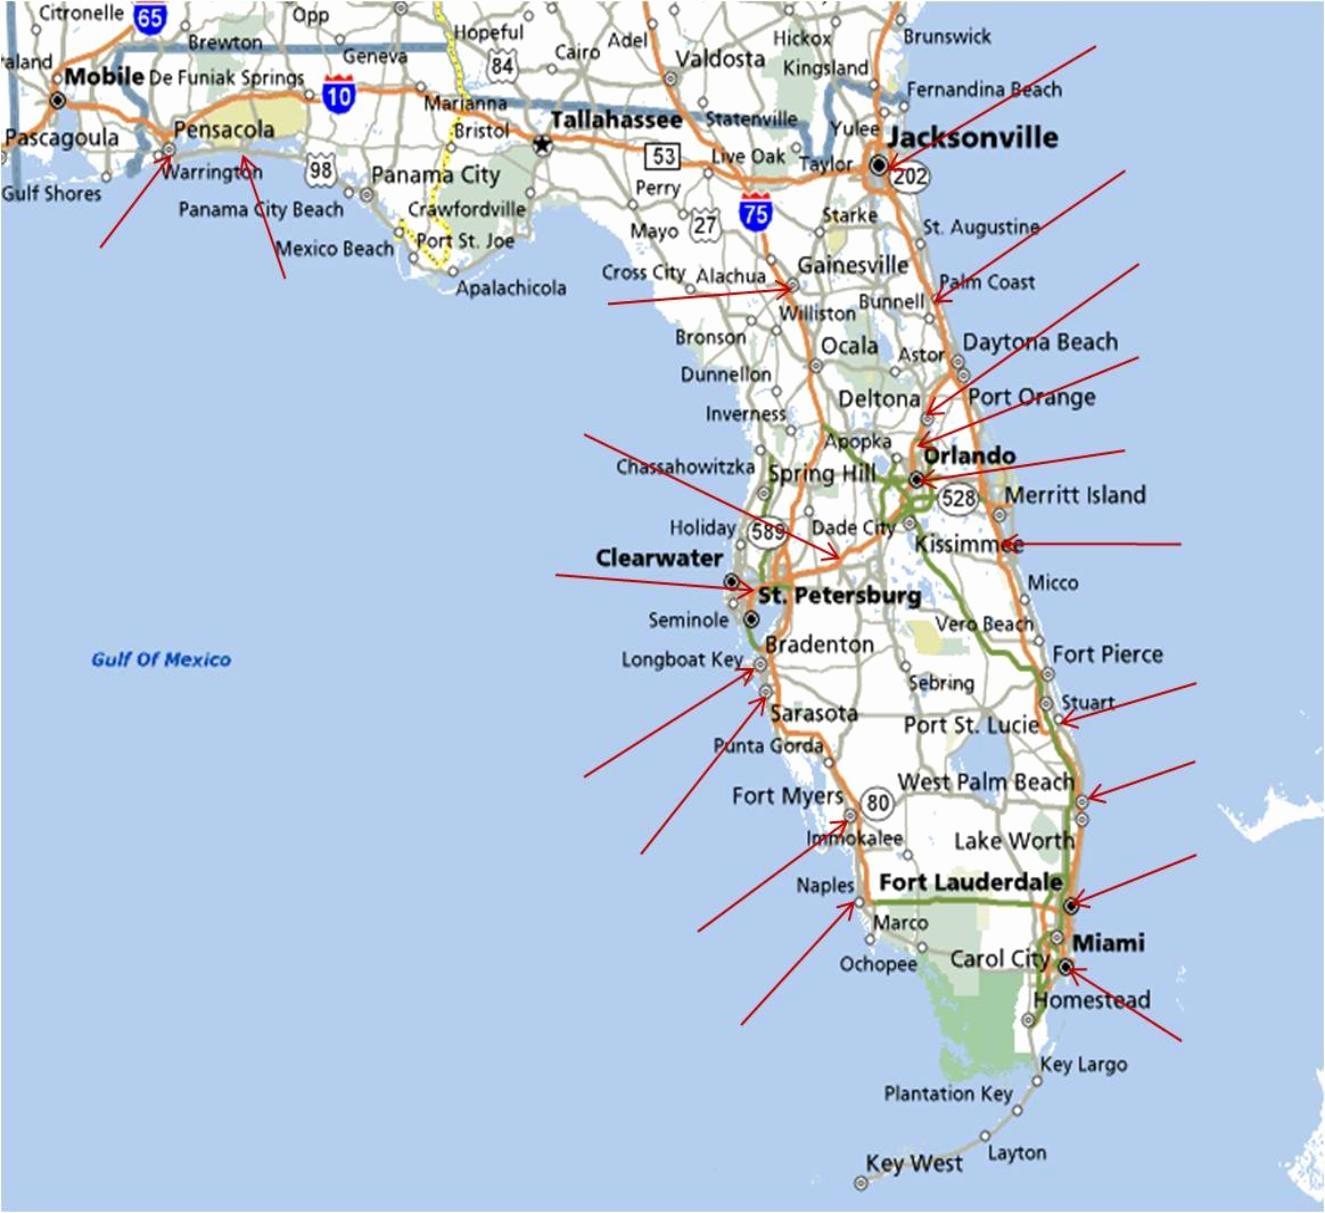 Best East Coast Florida Beaches New Map Florida West Coast Florida - Gulf Coast Cities In Florida Map